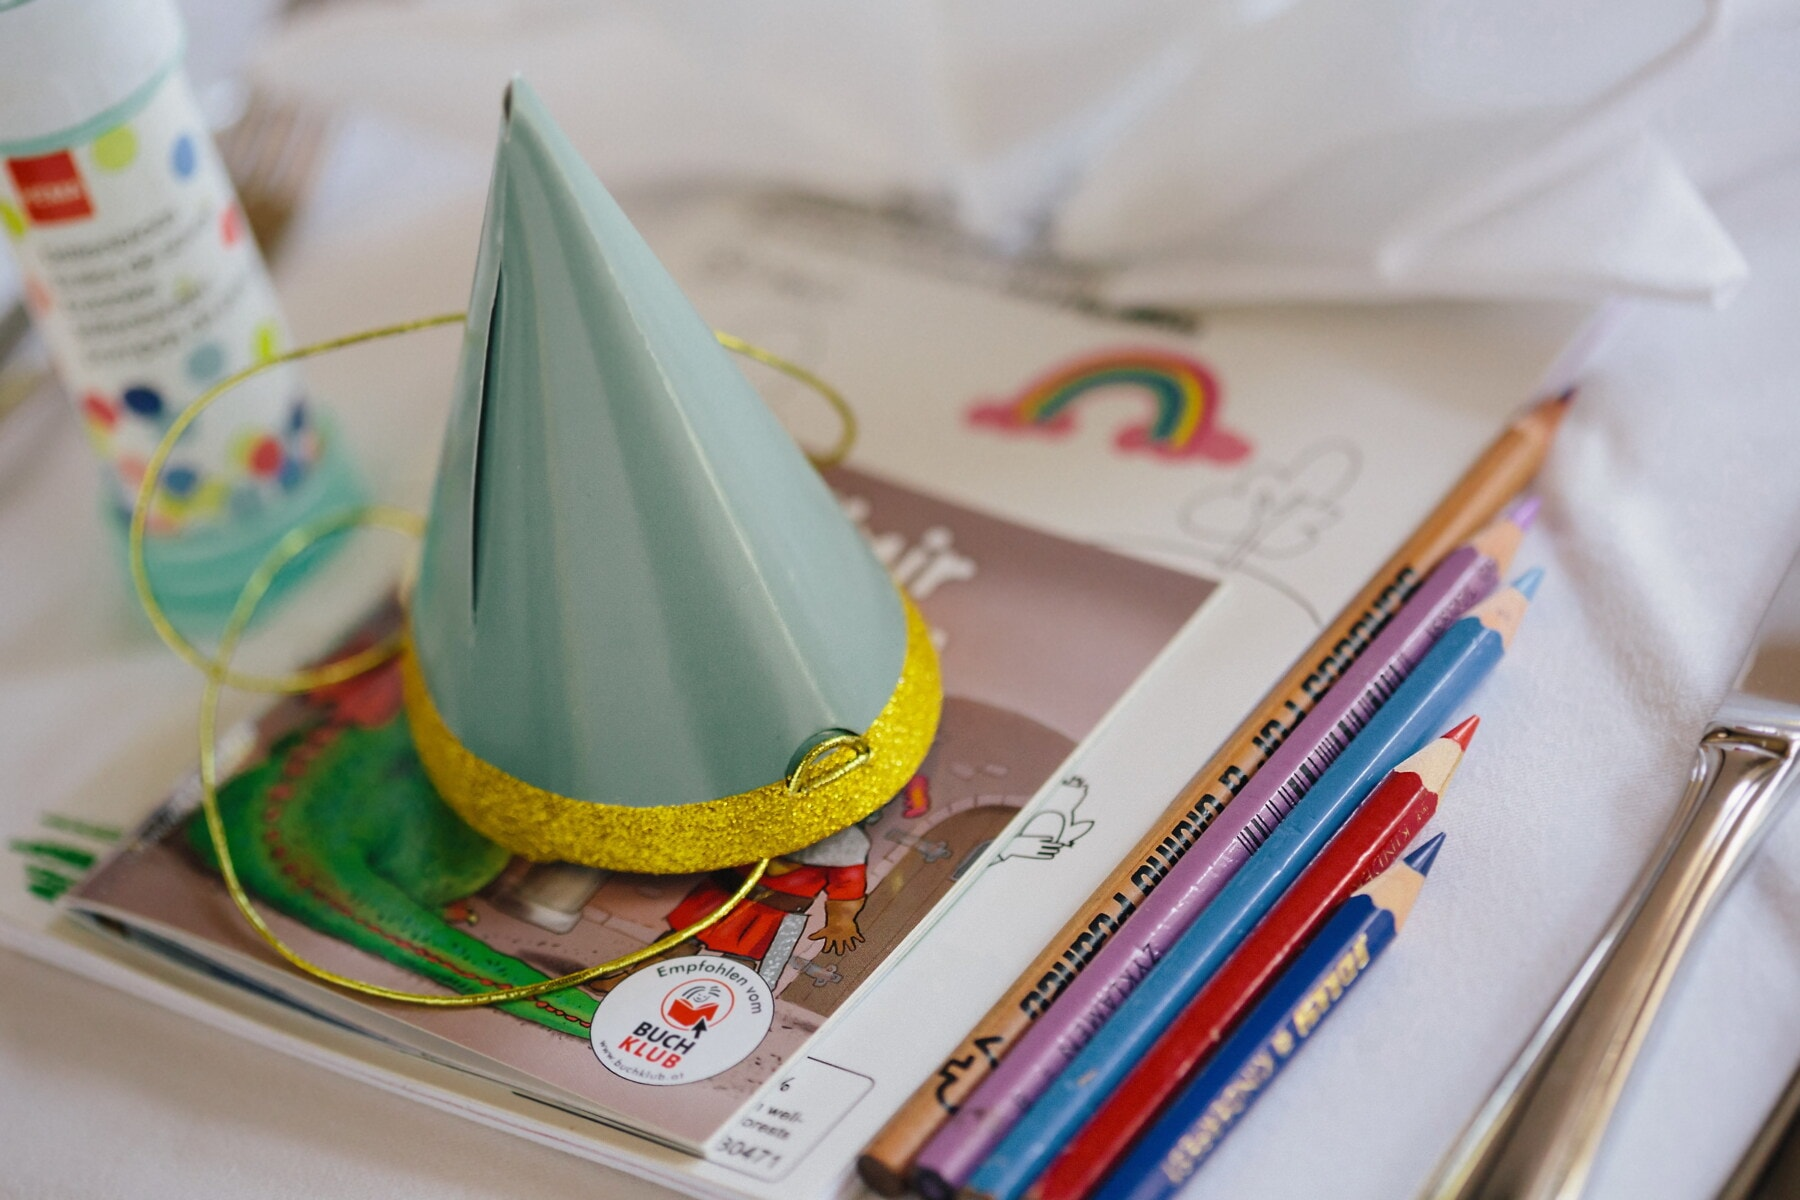 birthday, hat, notebook, cartoon, decoration, pencil, colors, paper, creativity, composition